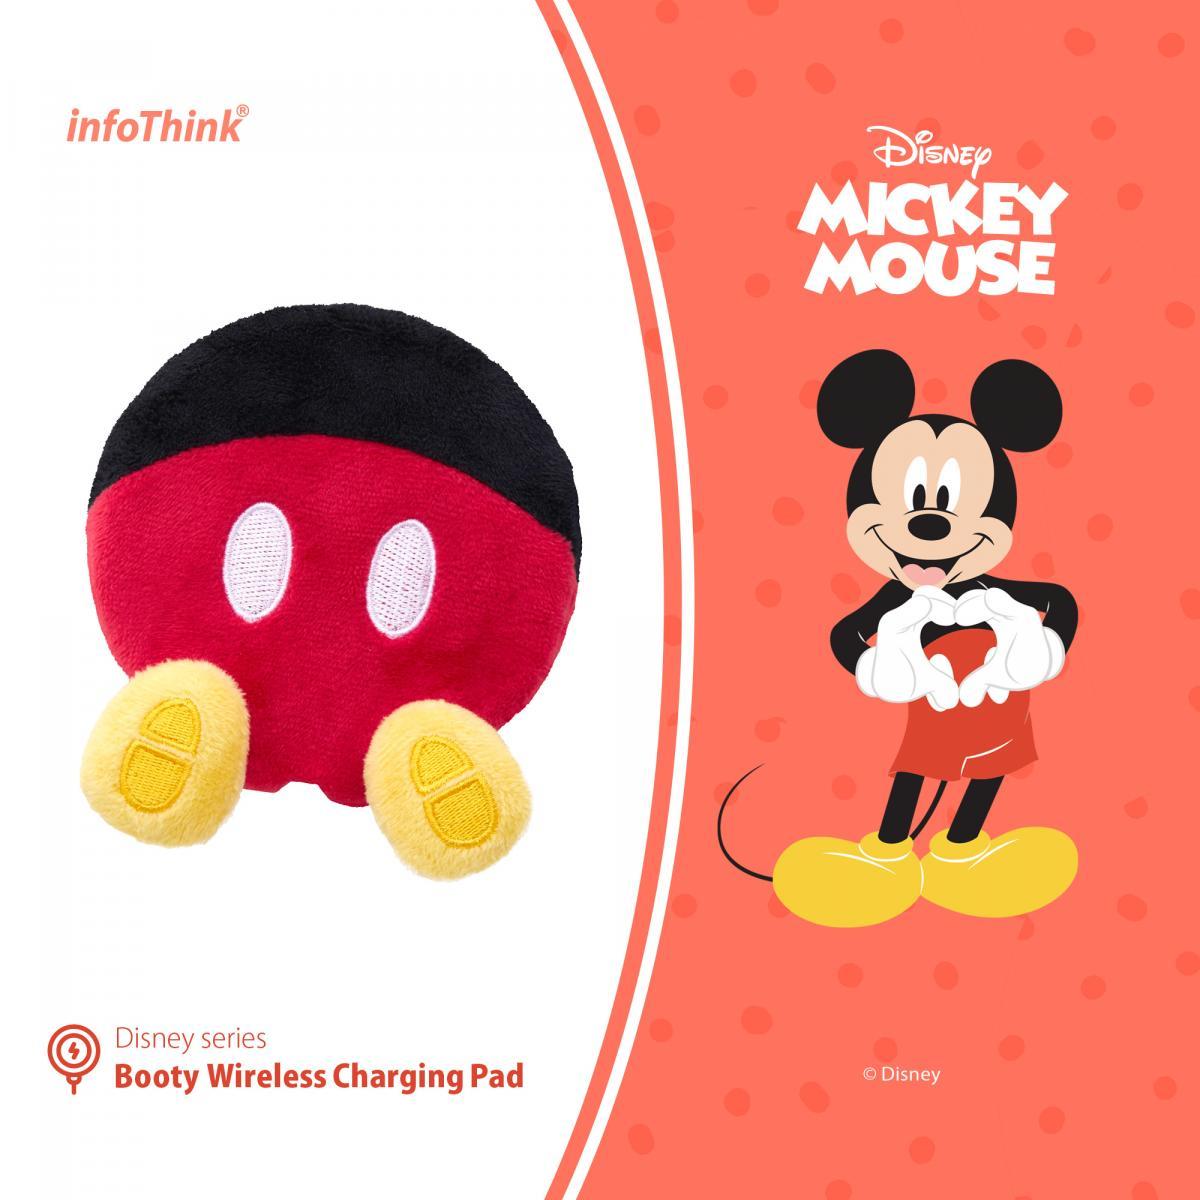 infoThink 迪士尼系列電臀無線充電座- 米老鼠(米奇) 史迪奇 維尼 唐老鴨 手機充電盤 無線充電器 正版3C